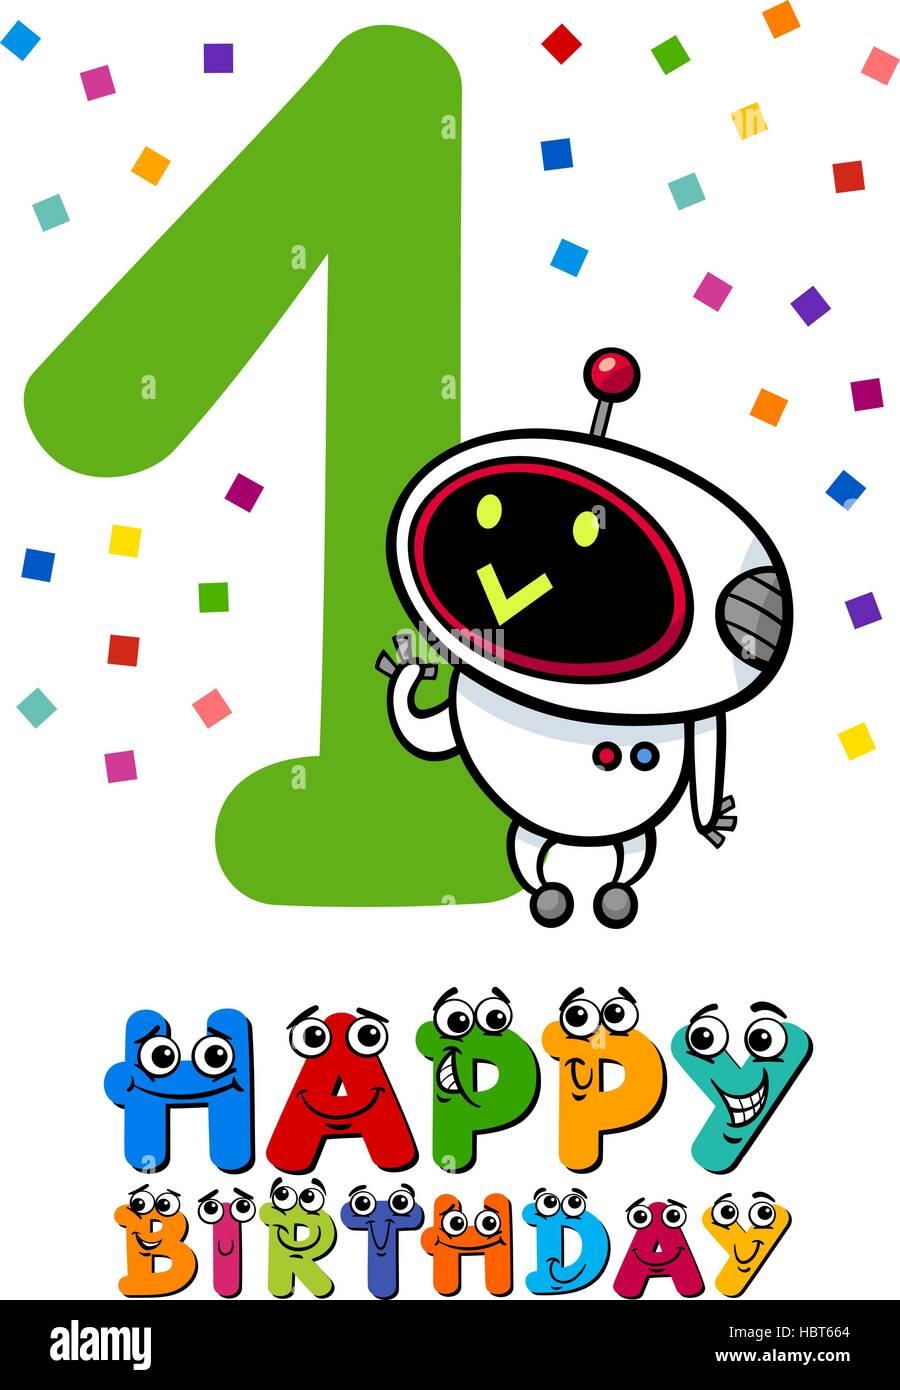 First Birthday Vector Vectors Imágenes De Stock & First Birthday ...